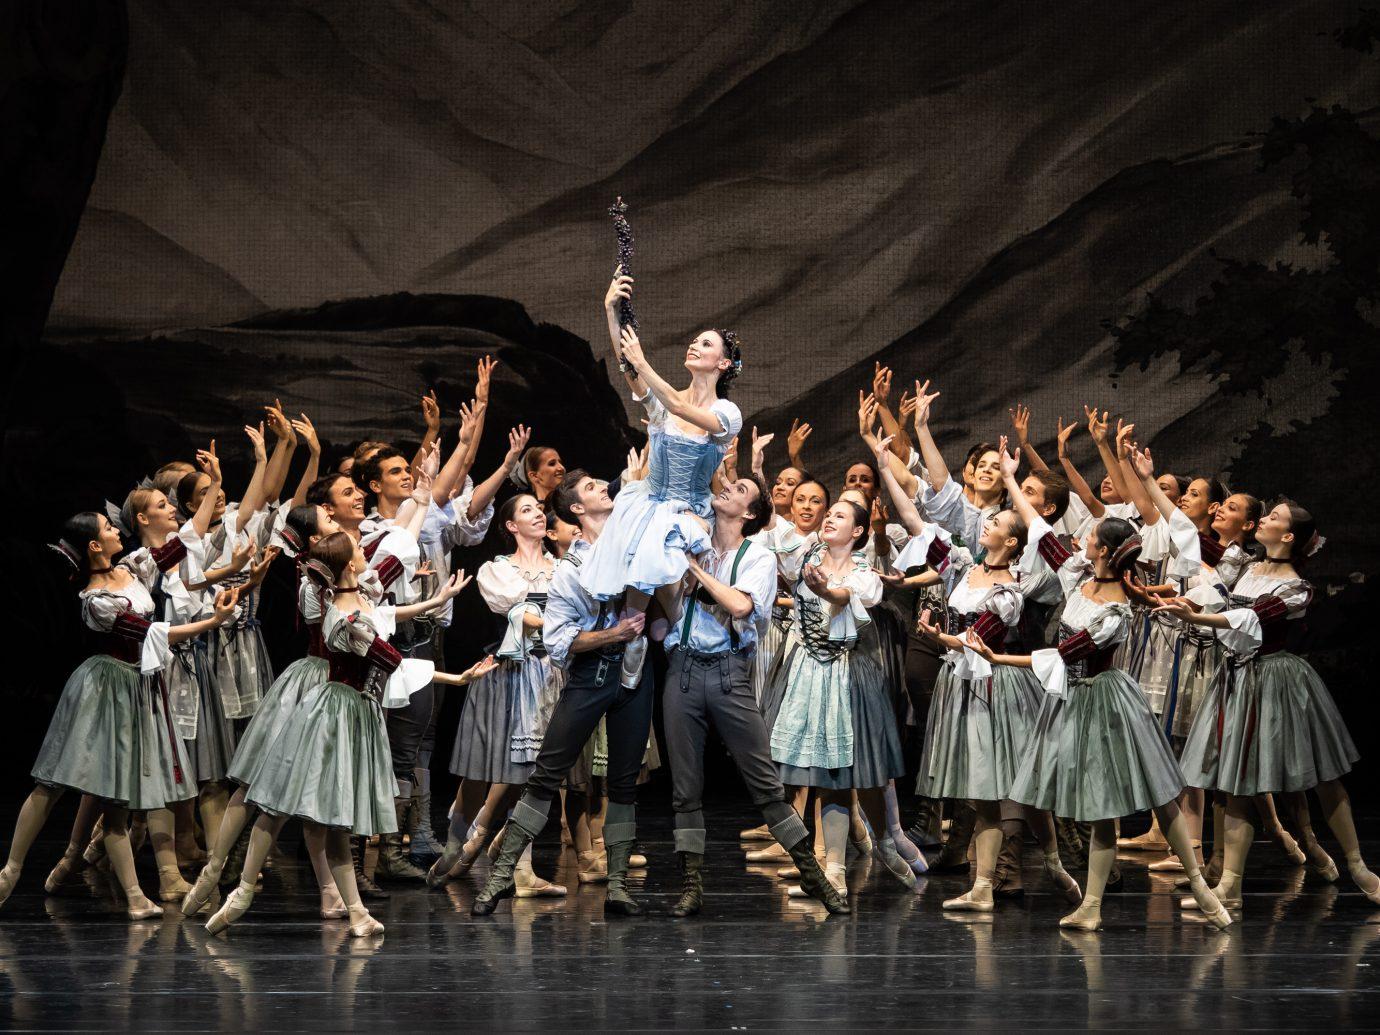 performance at Wiener Staatsoper